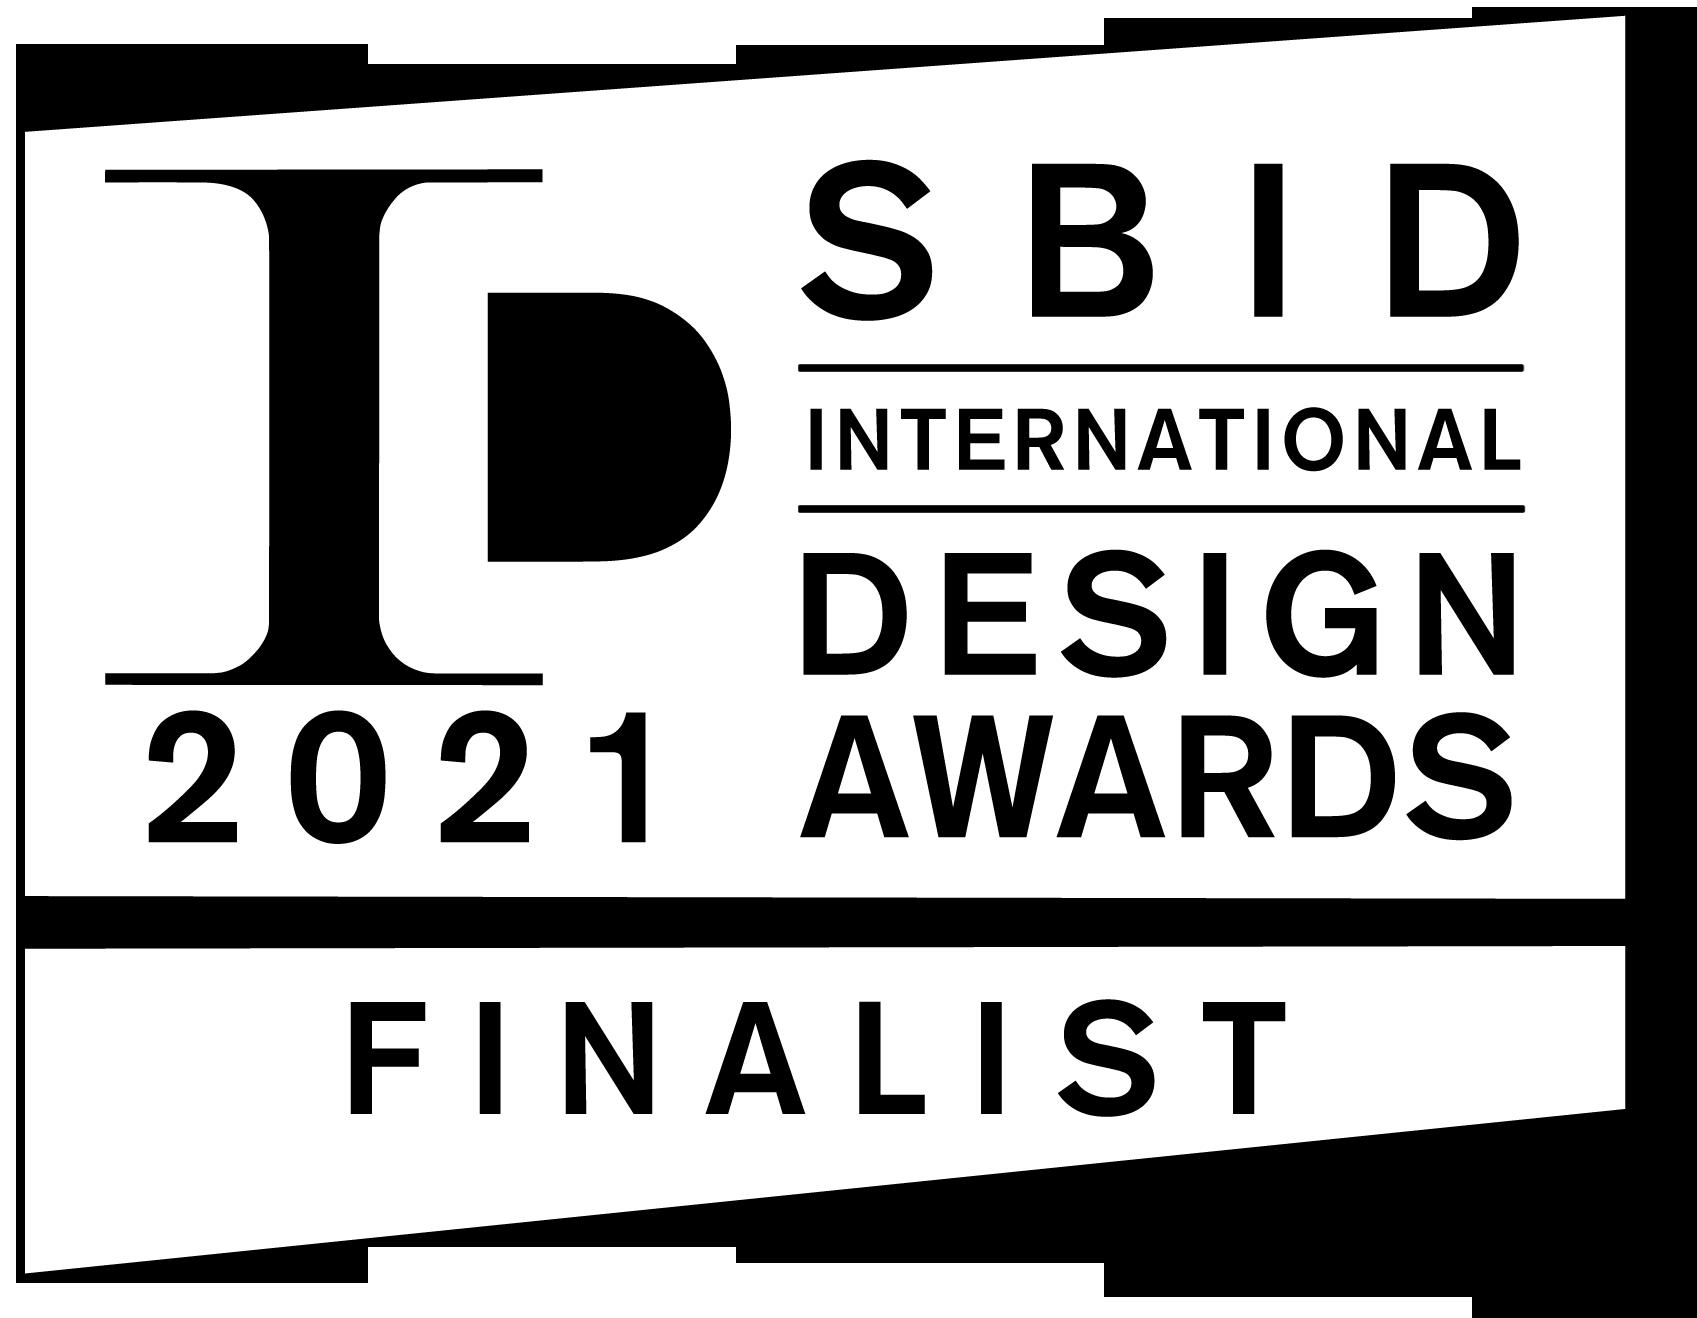 https://www.sbidawards.com/finalistcategory/kbb-design-2021/